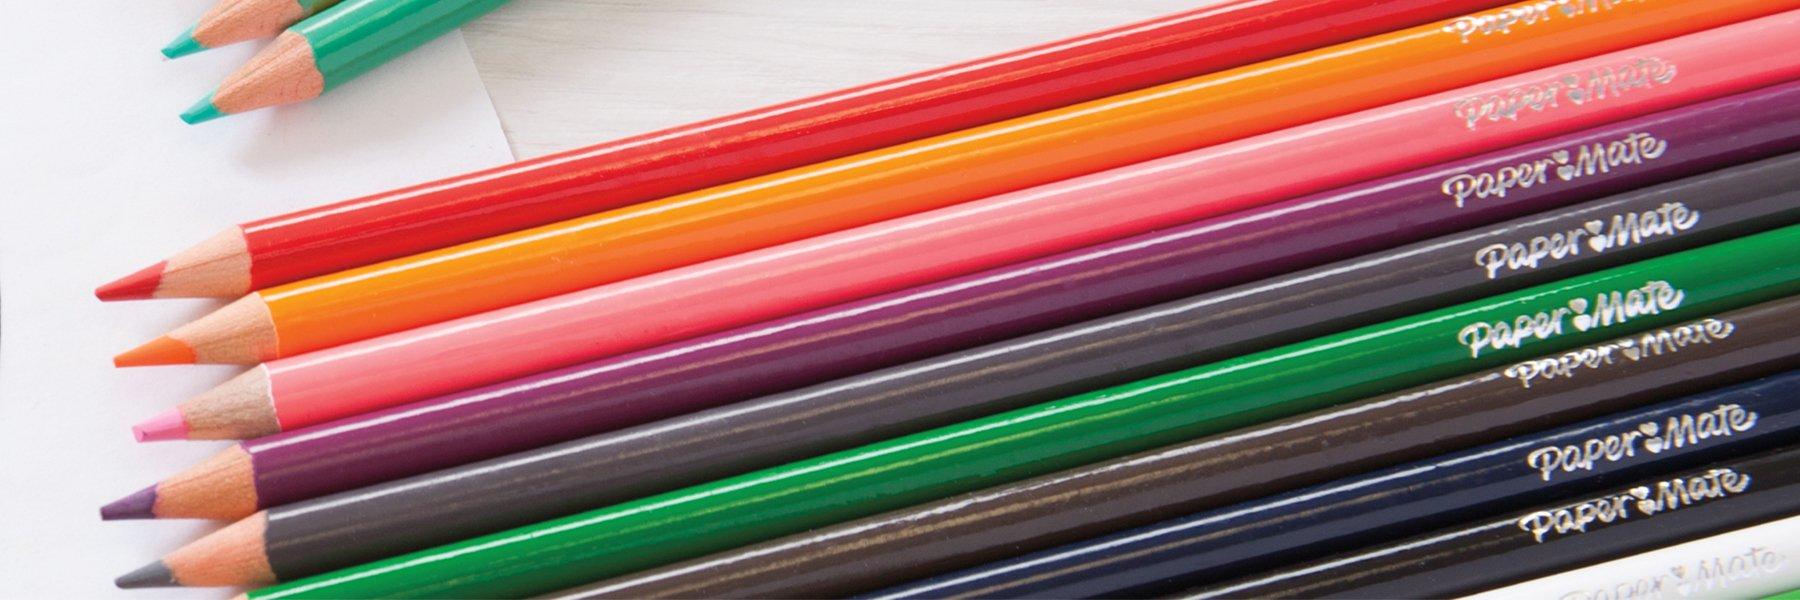 papermatecoloredpencilsplpbp3p.jpg